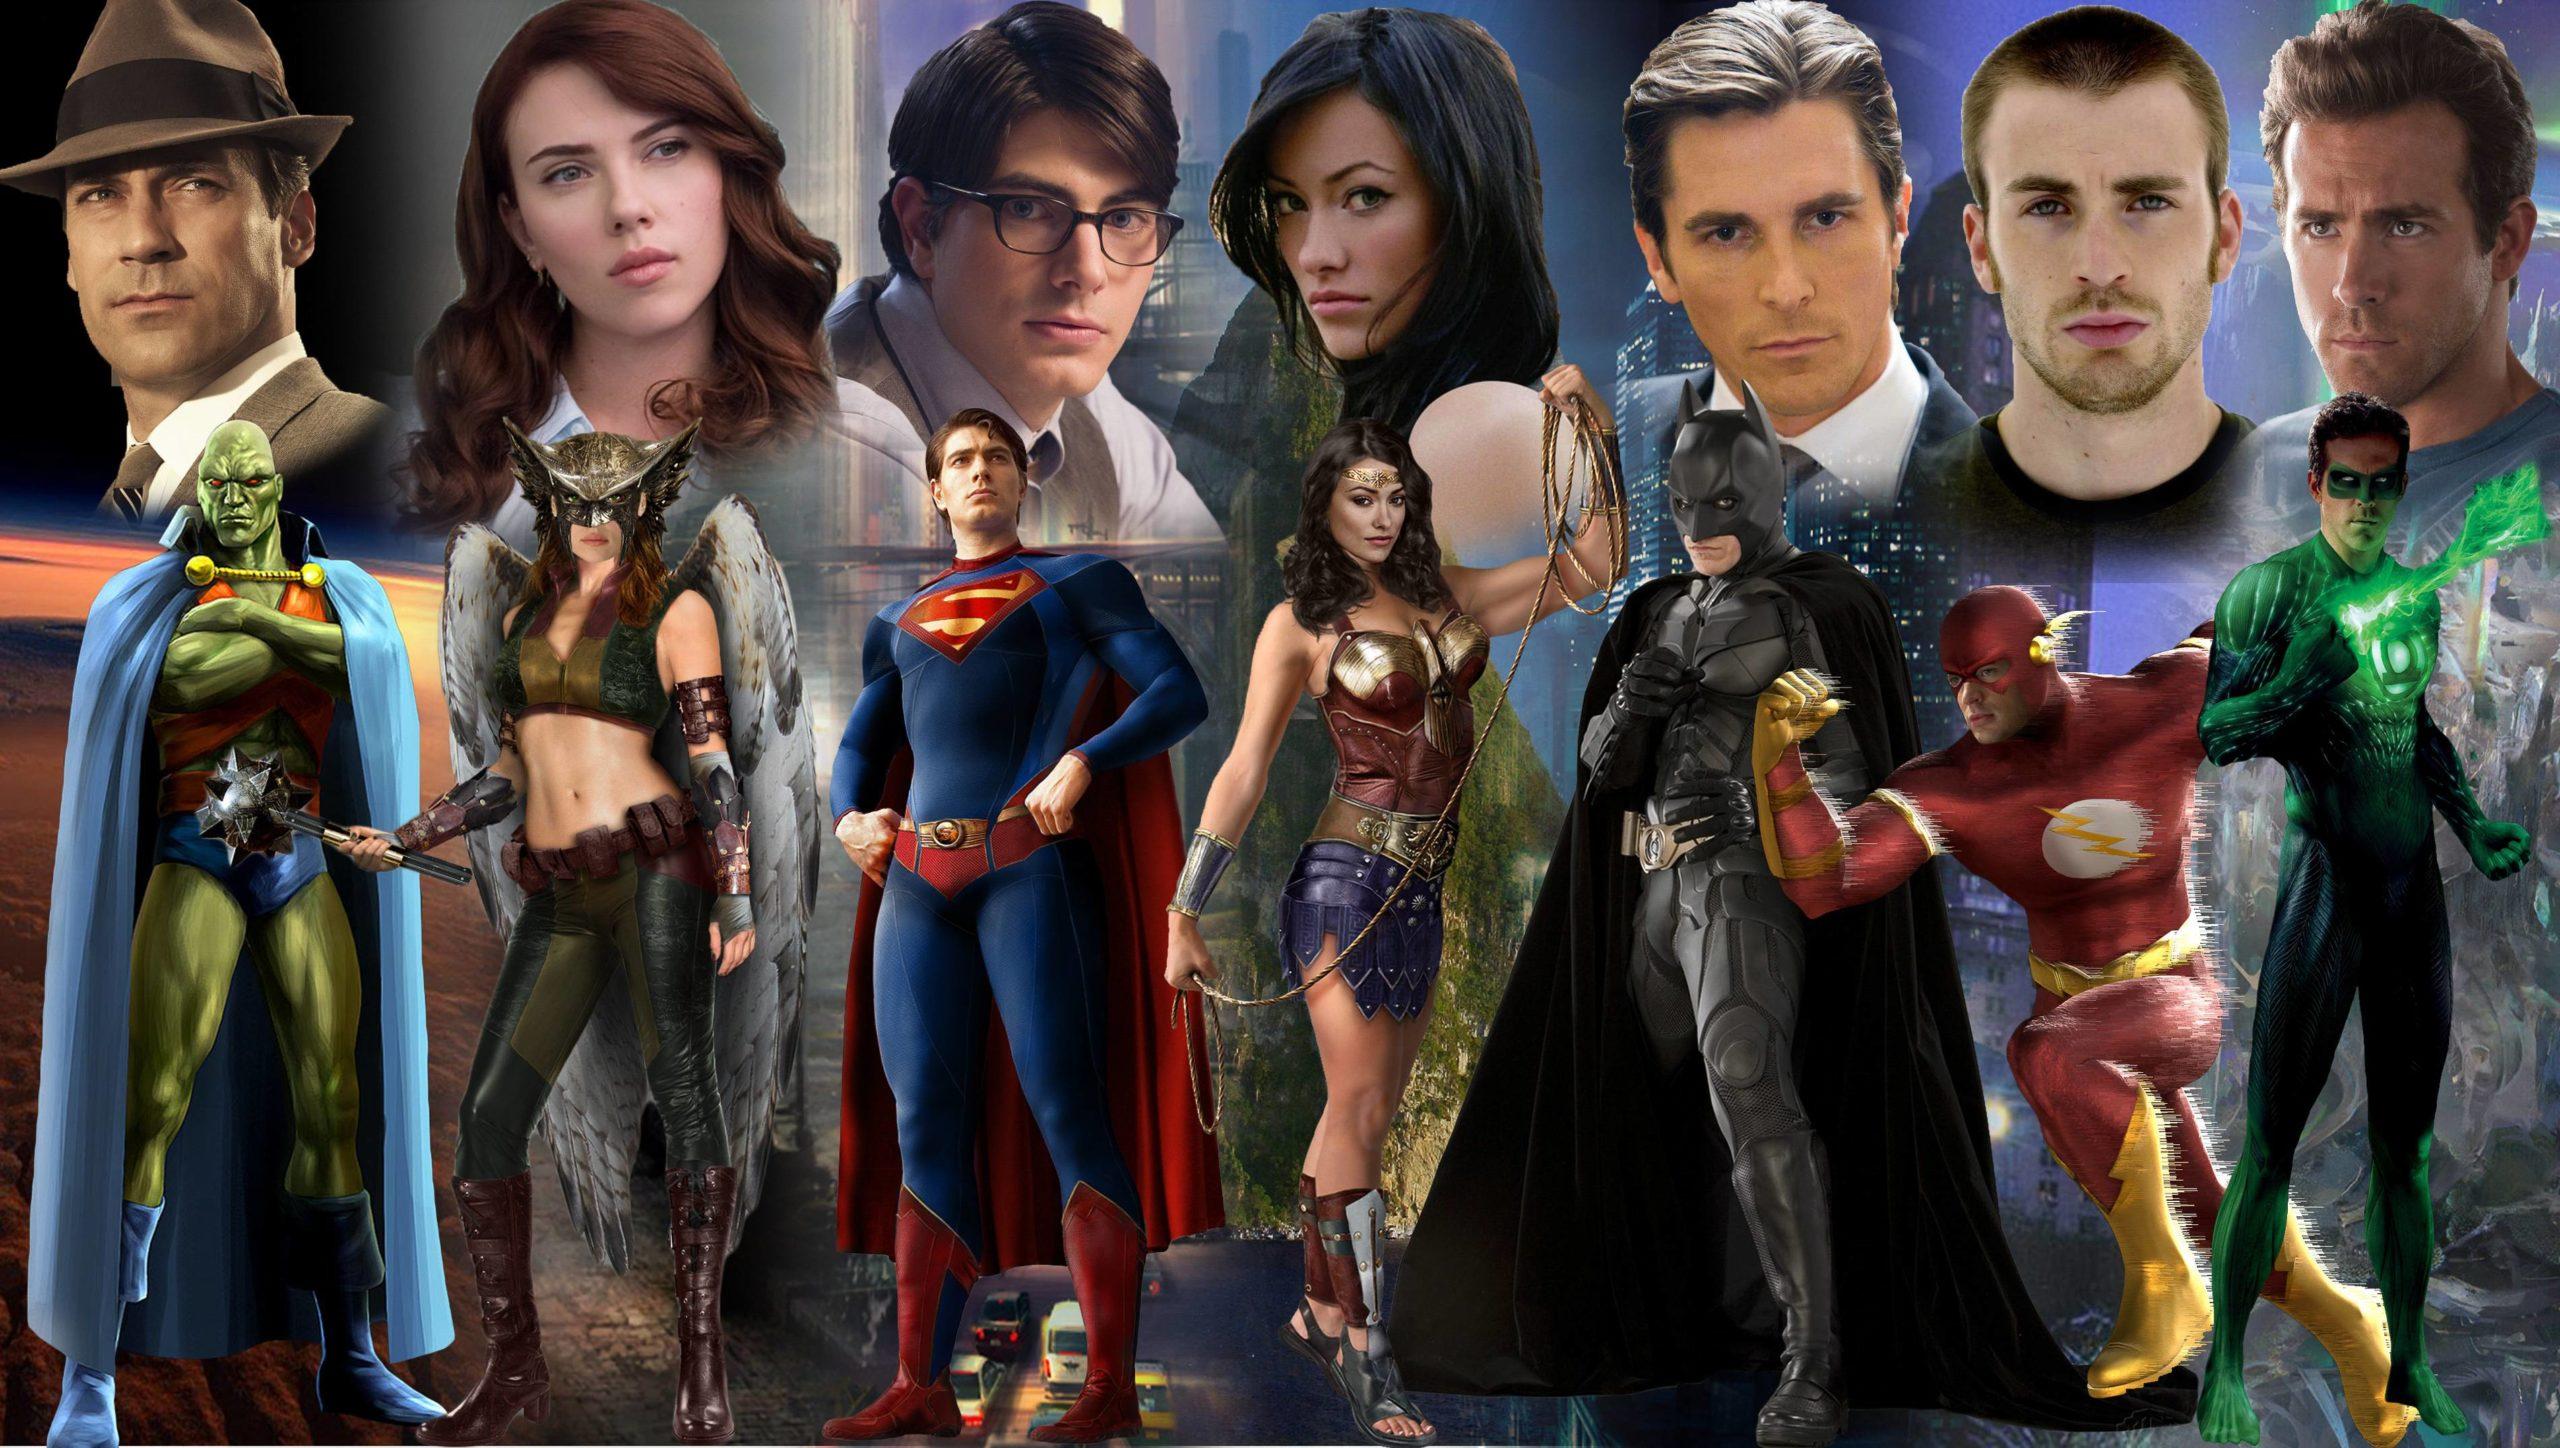 justice league pics